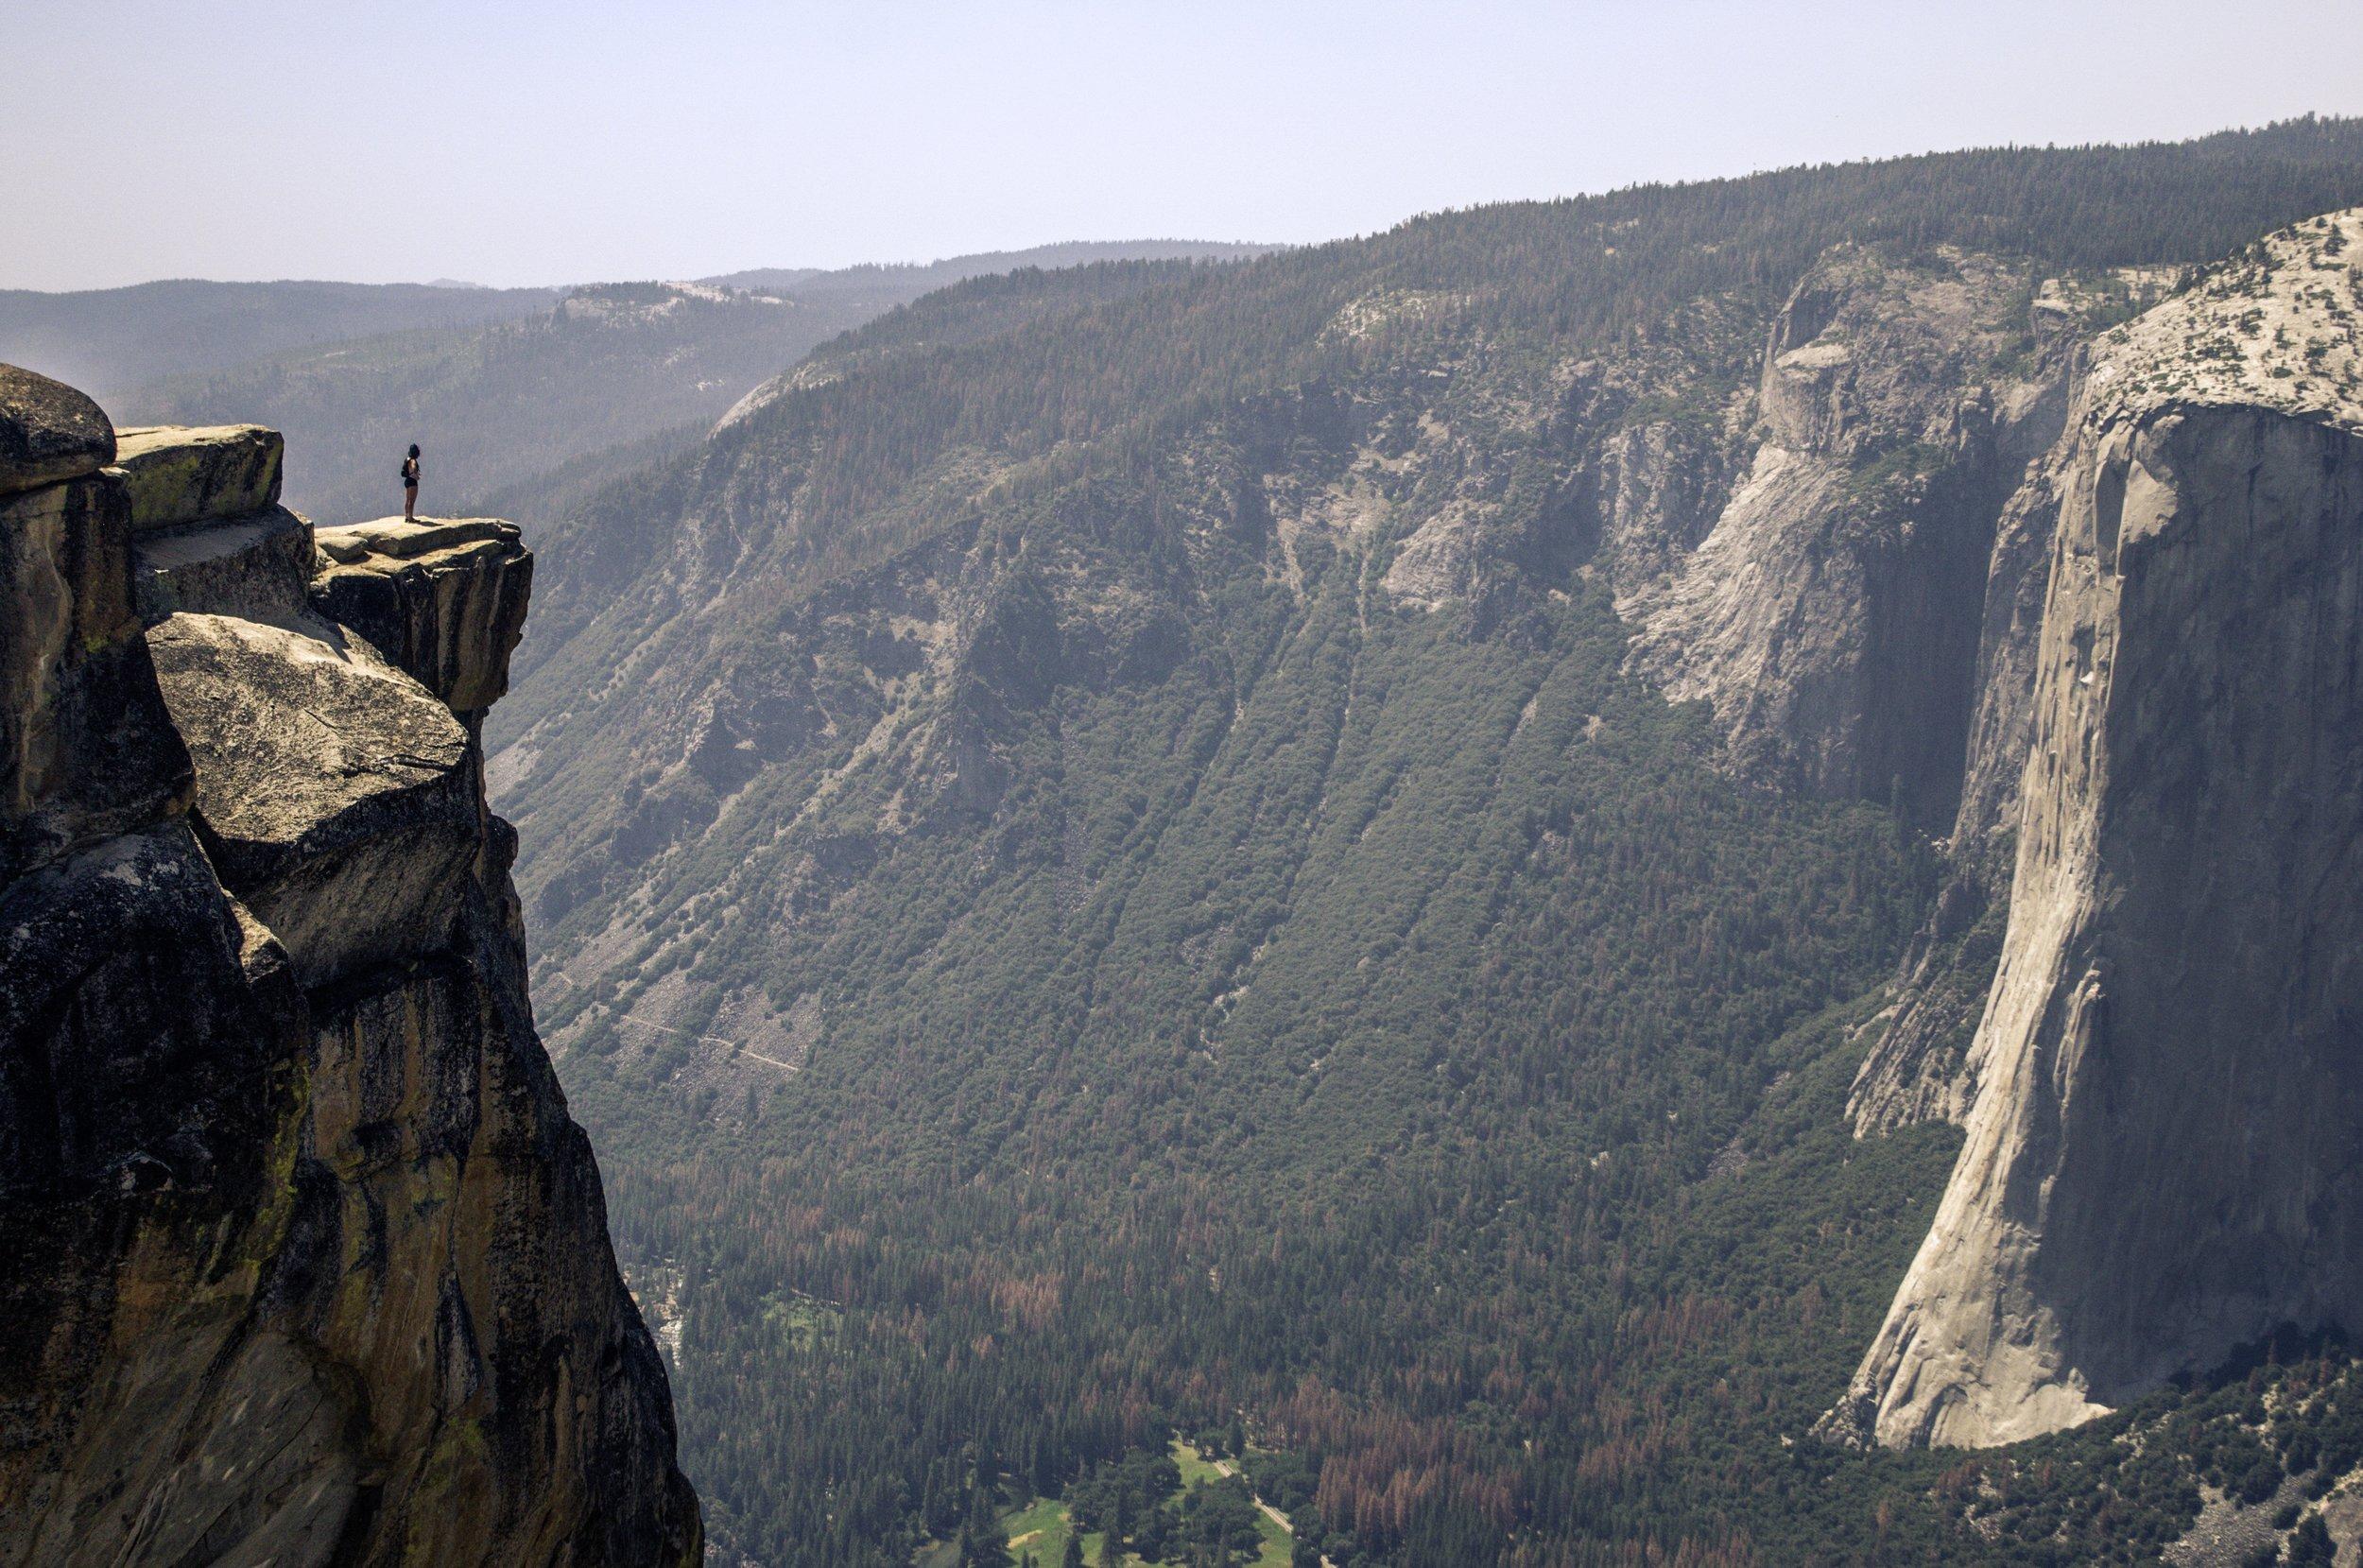 Taft Point. Yosemite National Park, California.